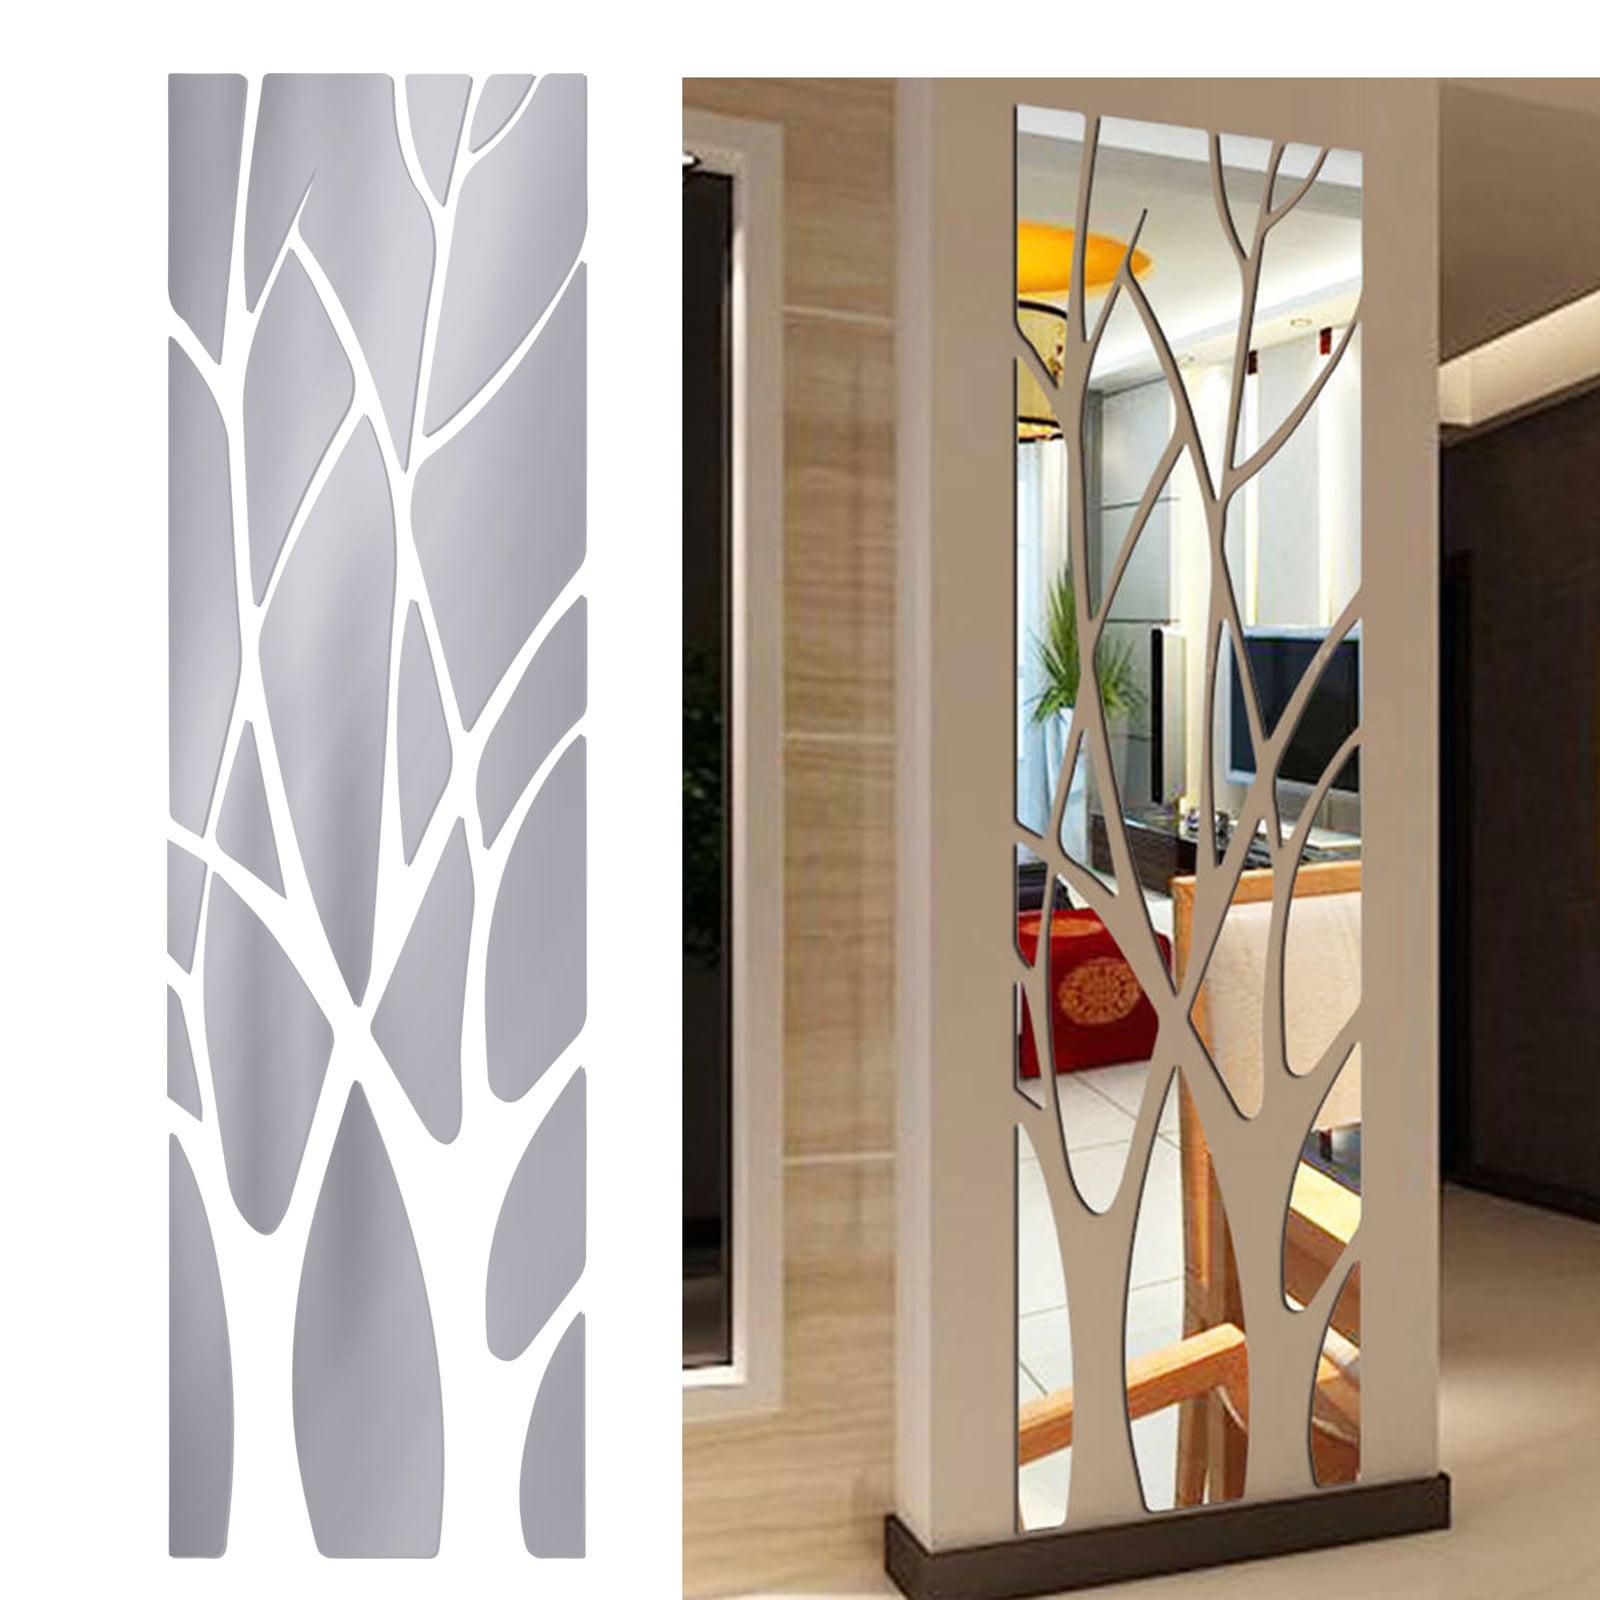 Small Mirror Tiles Glass Wall Stickers Self Adhesive Reflective Bathroom Mosaic